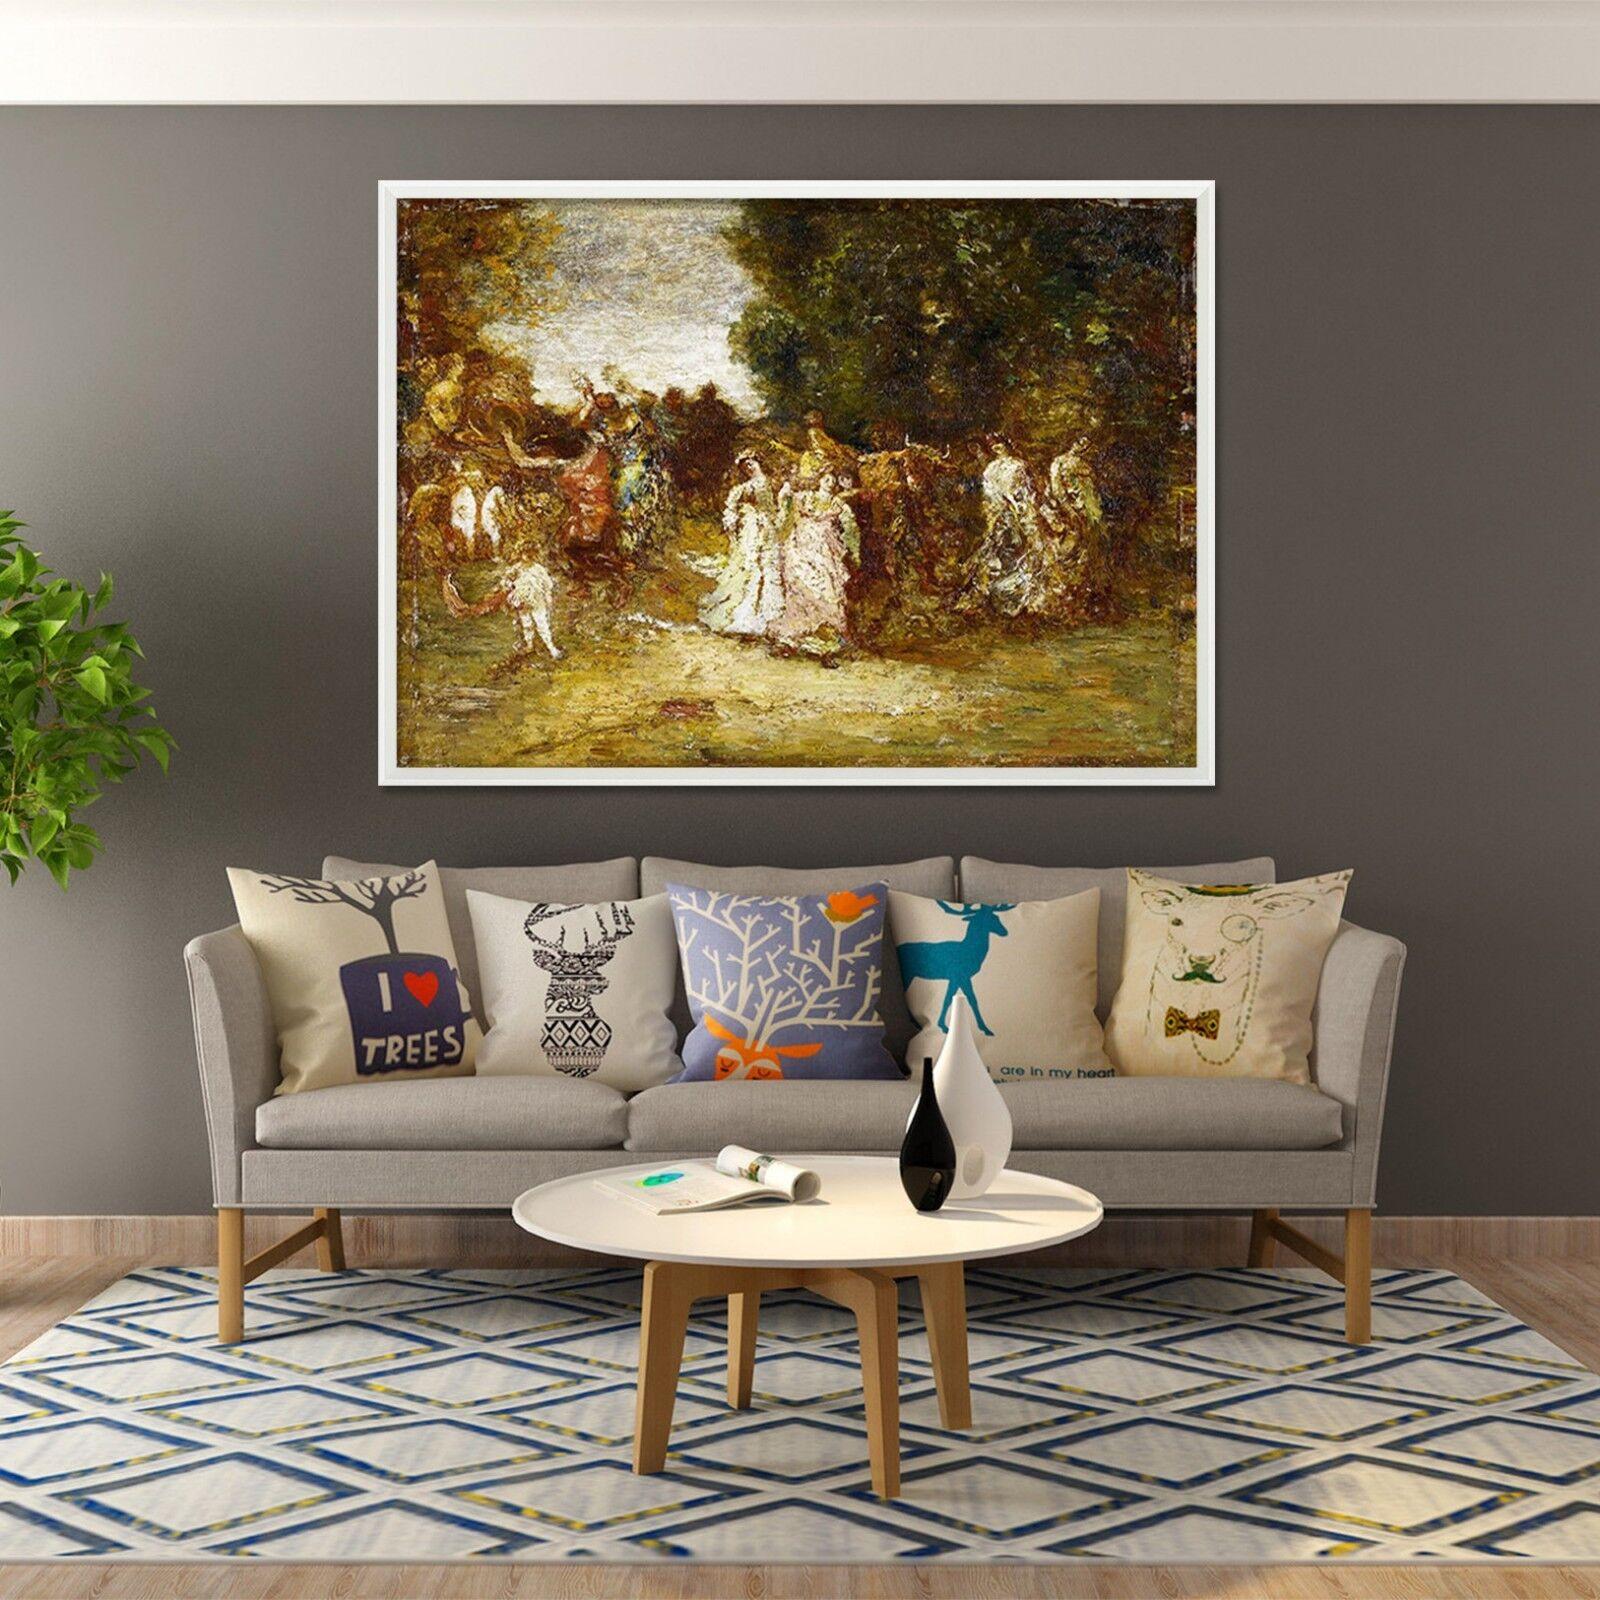 3D Europe Noble Painting 2 Framed Poster Home Decor Print Painting Art WALLPAPER